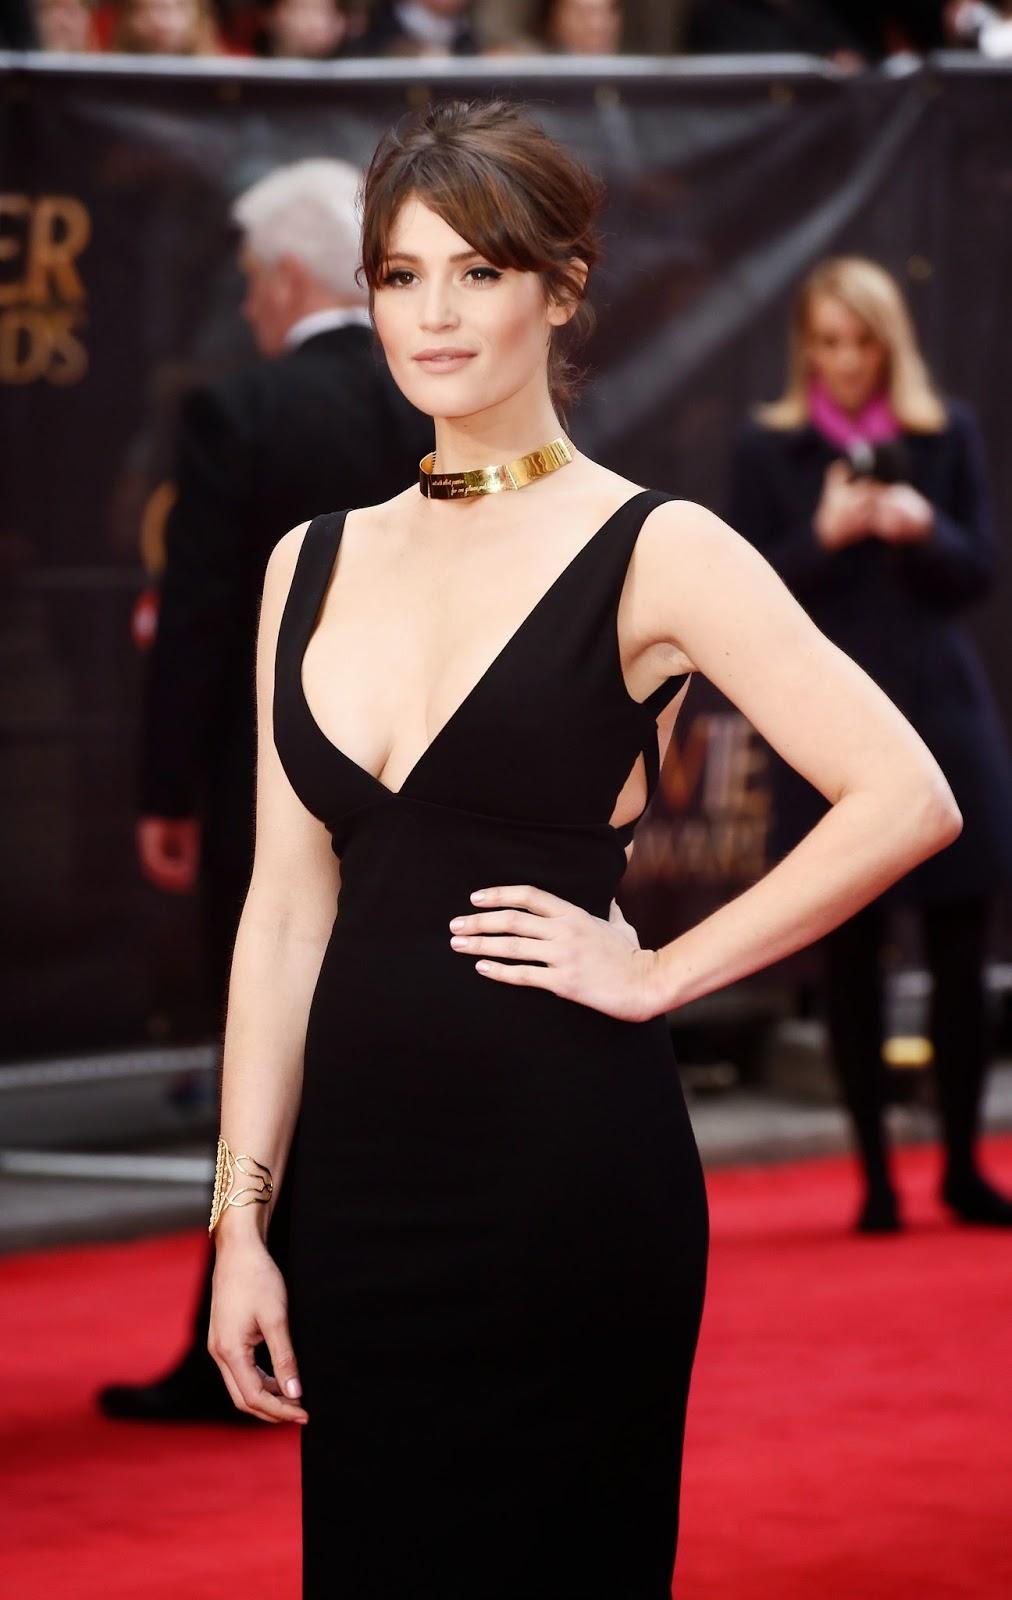 Actress @ Gemma Arterton - The Olivier Awards in London